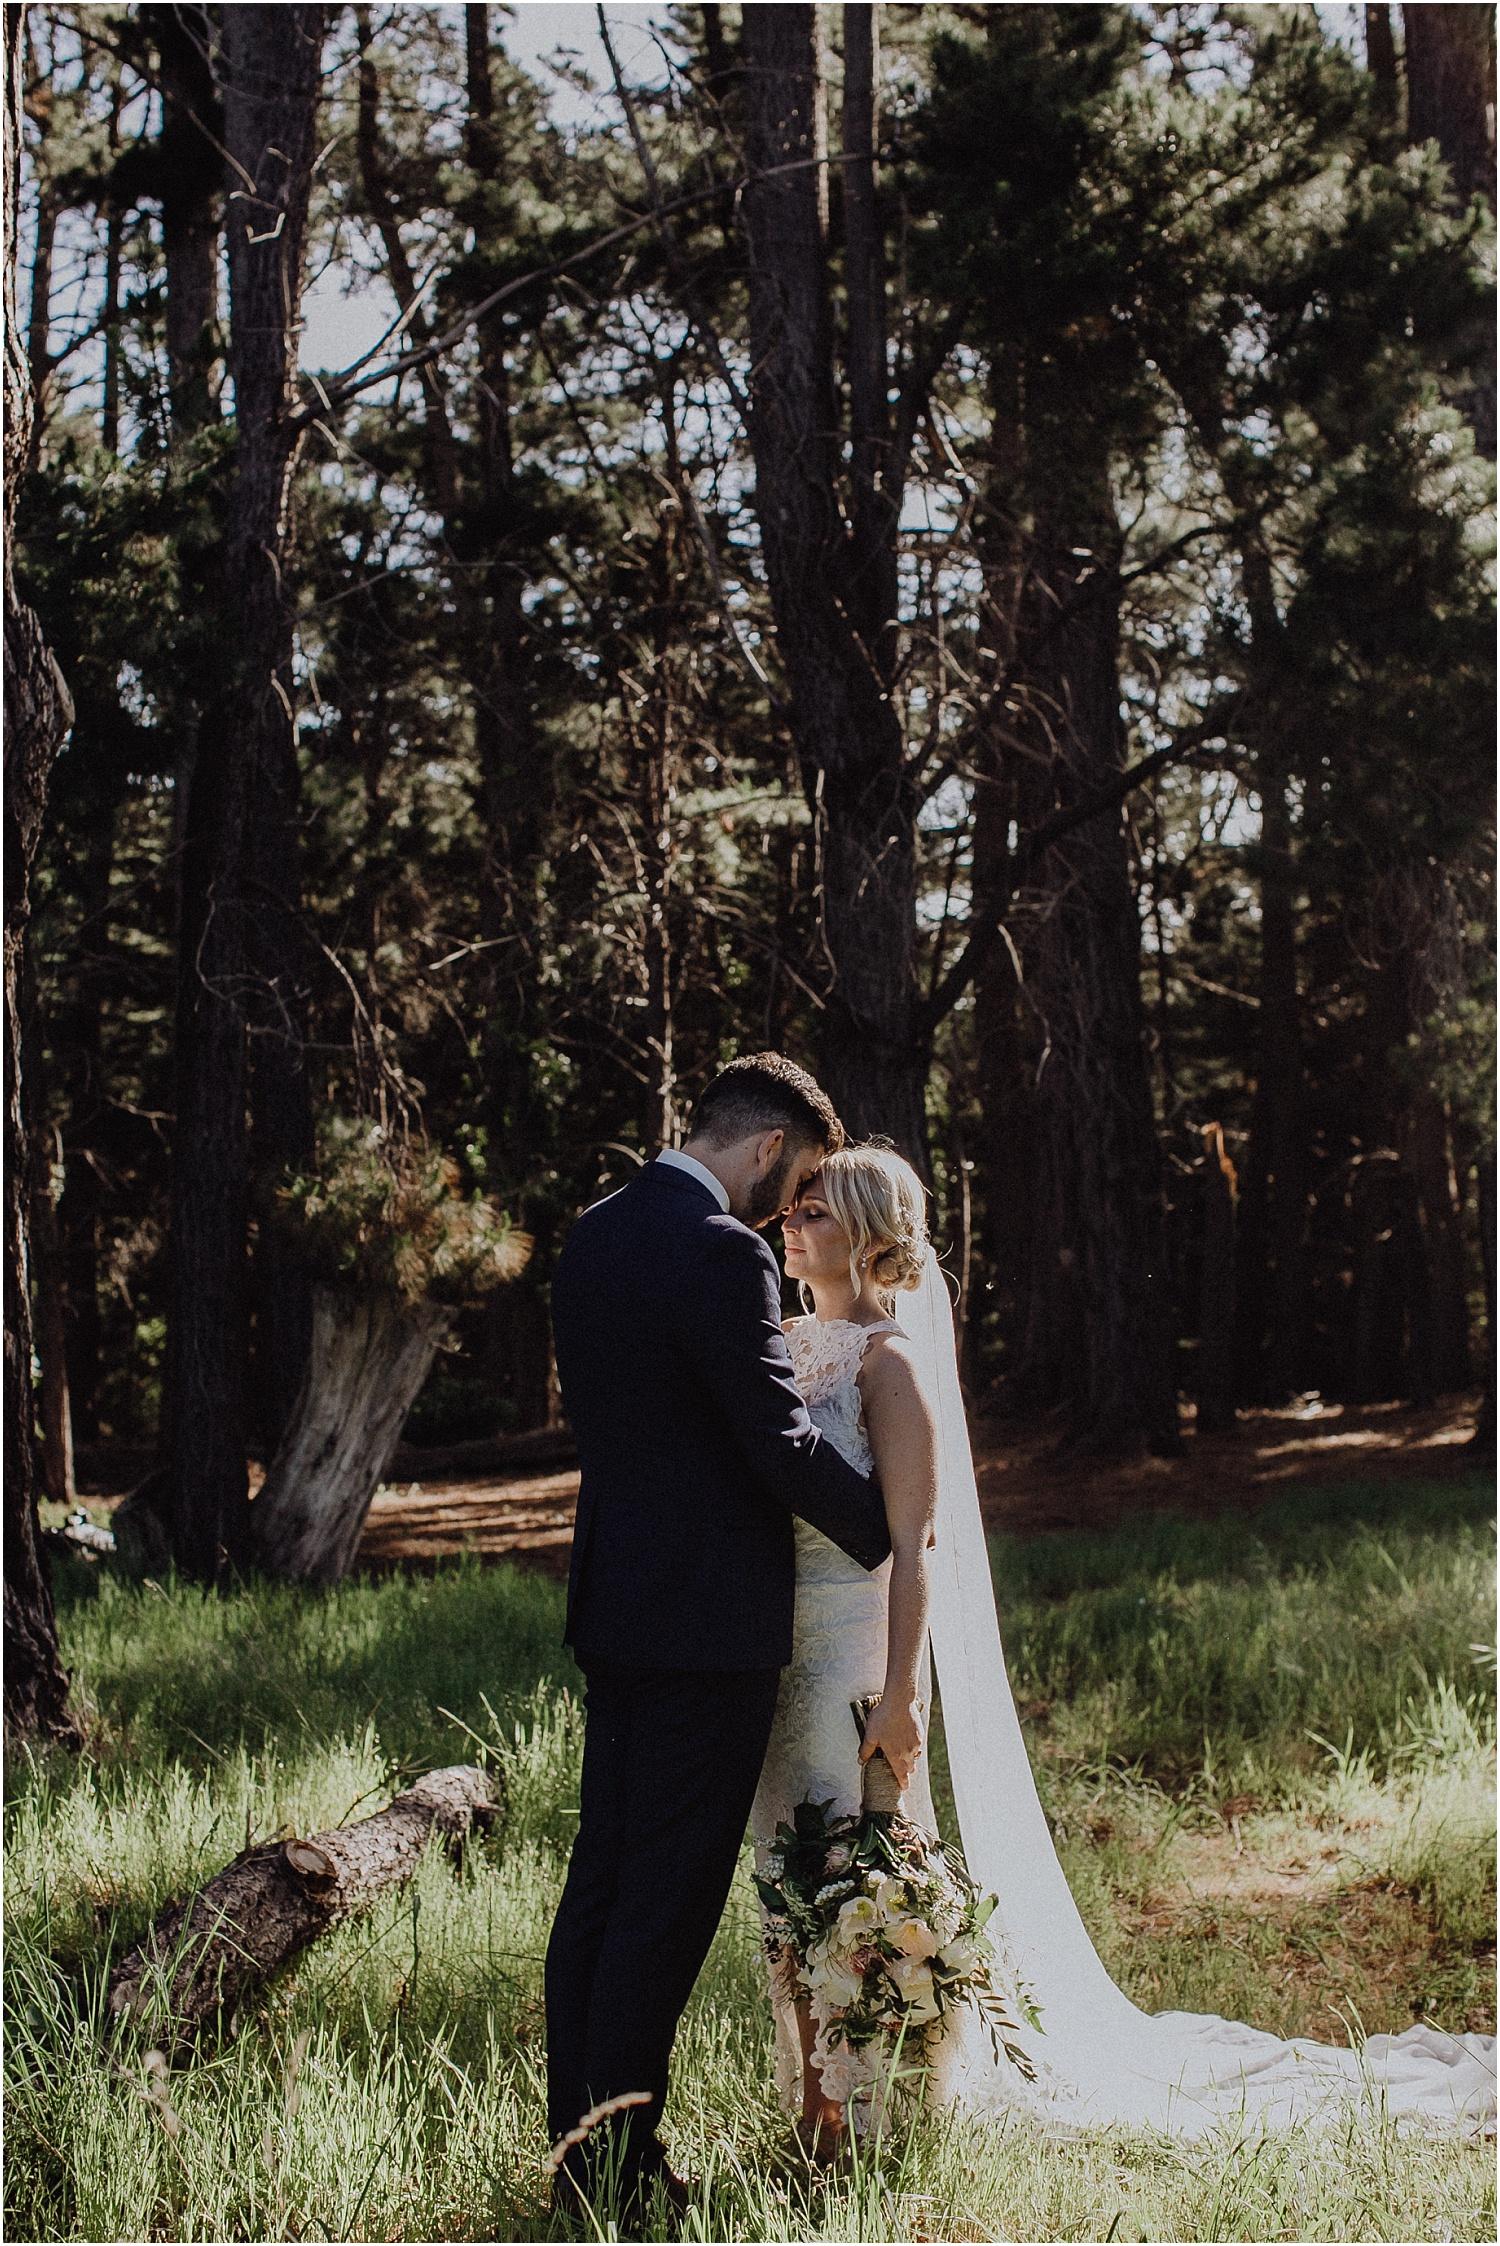 Nicolle and Damien's tipi wedding at the Flinders Yacht Club on the Mornington Peninsula._0106.jpg